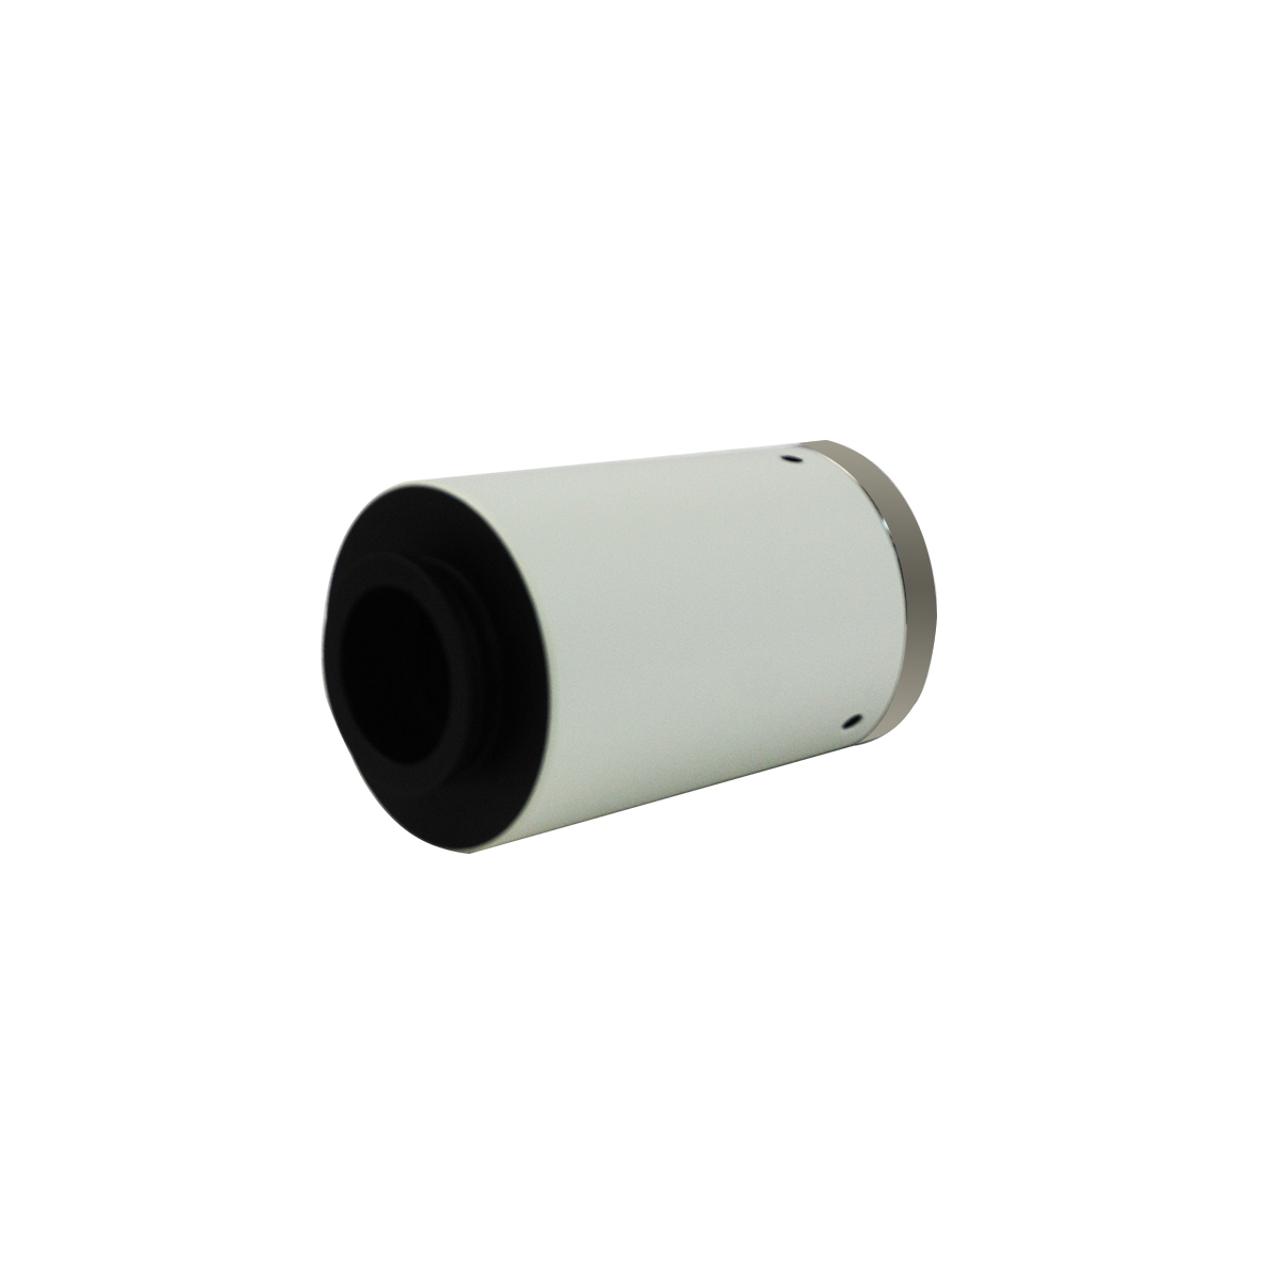 Leica Compatible 1X DM Microscope Camera Adapter for DSLR Cameras CP02522501